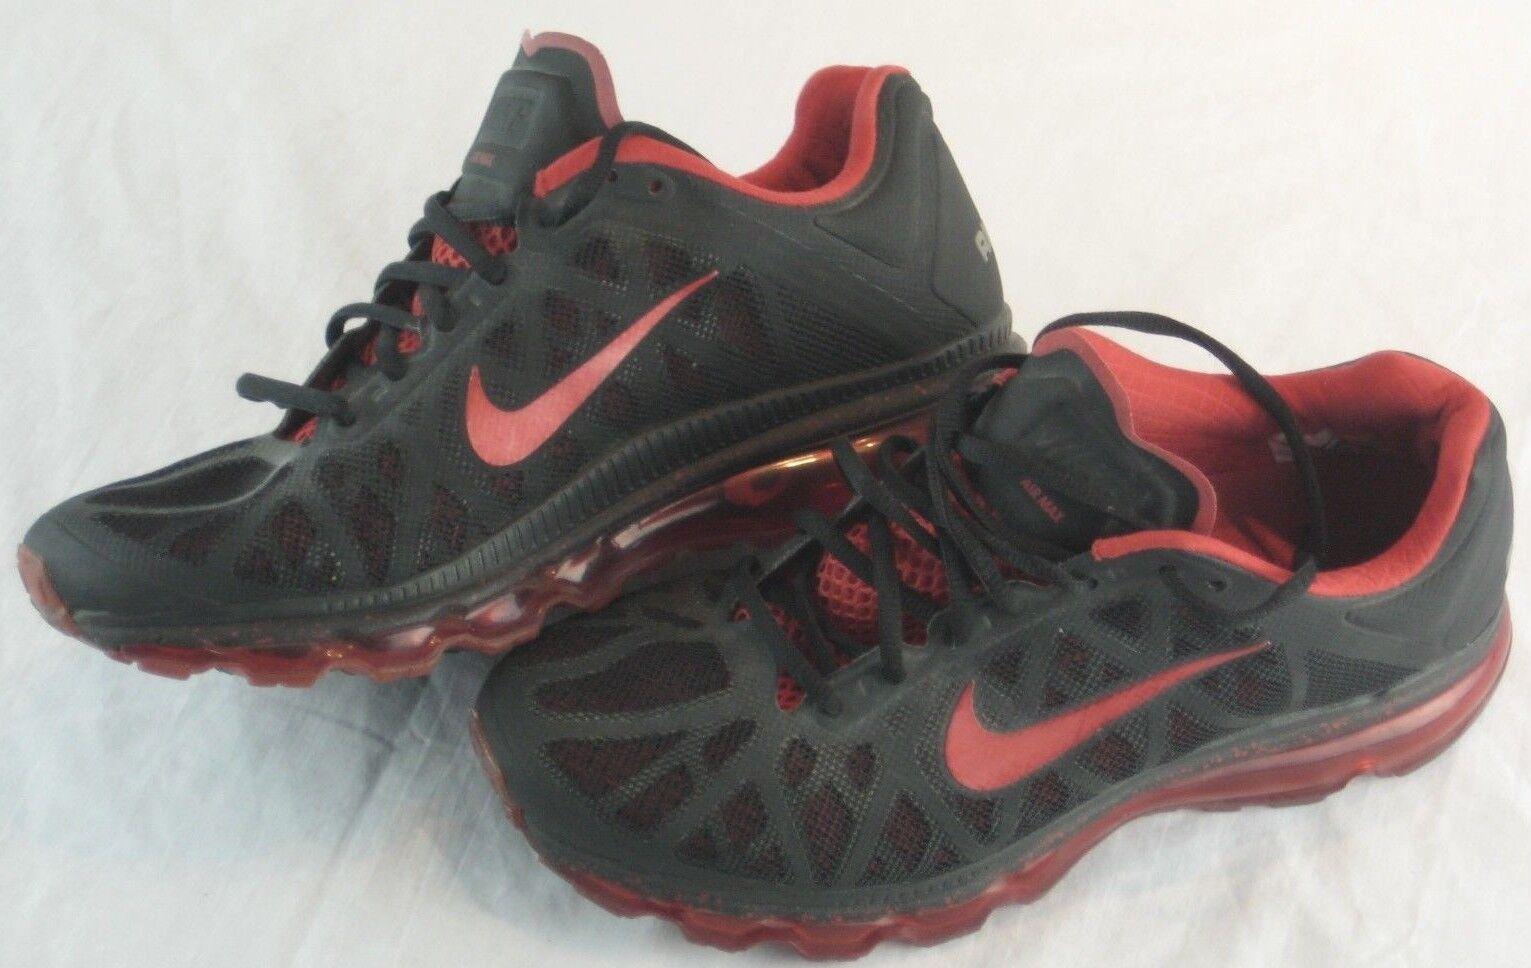 Nike Air Max Breds Running Air Max+ Red Black 429889-060 Men's US size 9.5